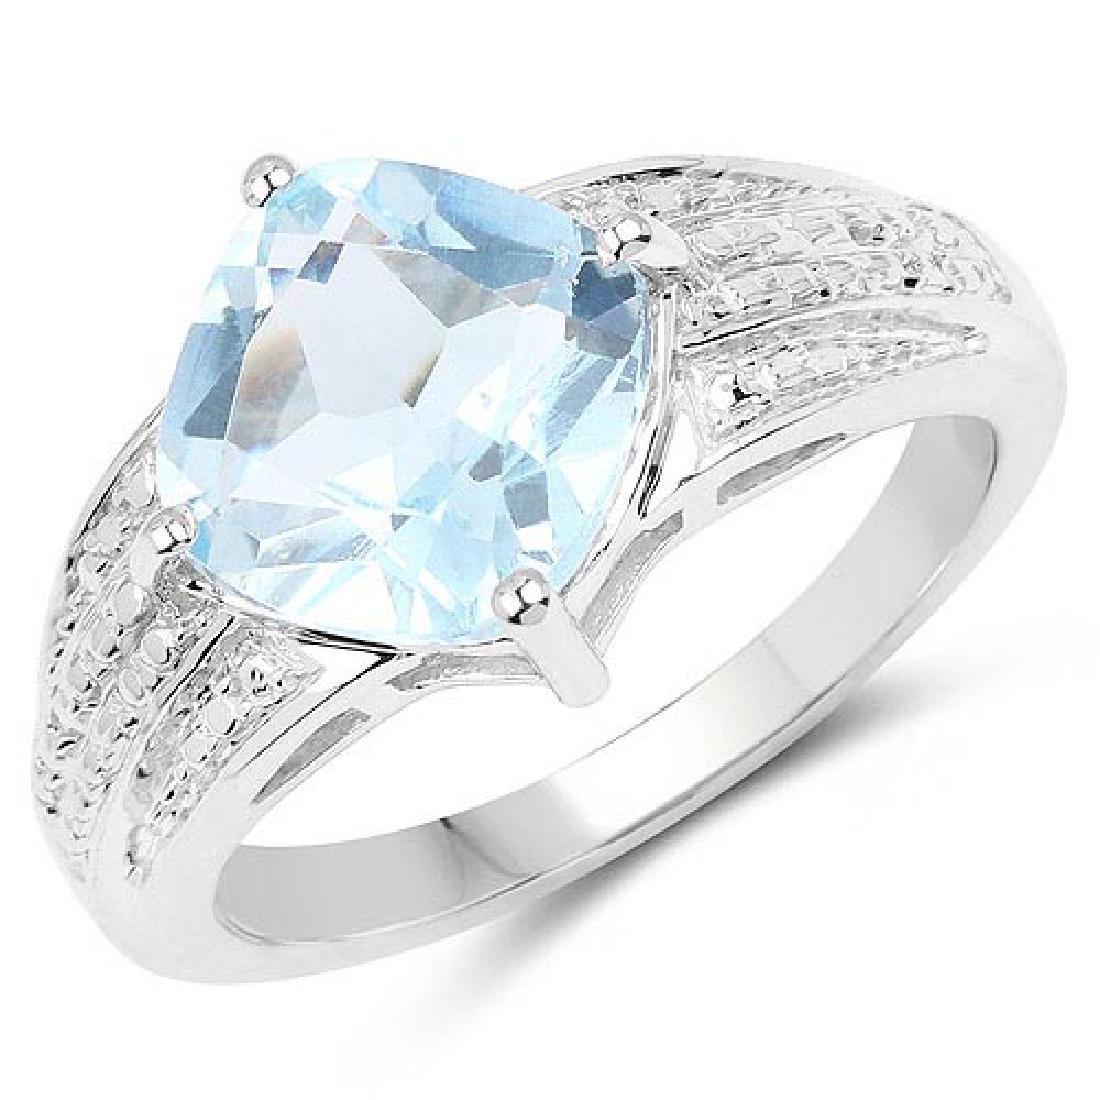 3.65 Carat Genuine Blue Topaz .925 Sterling Silver Ring